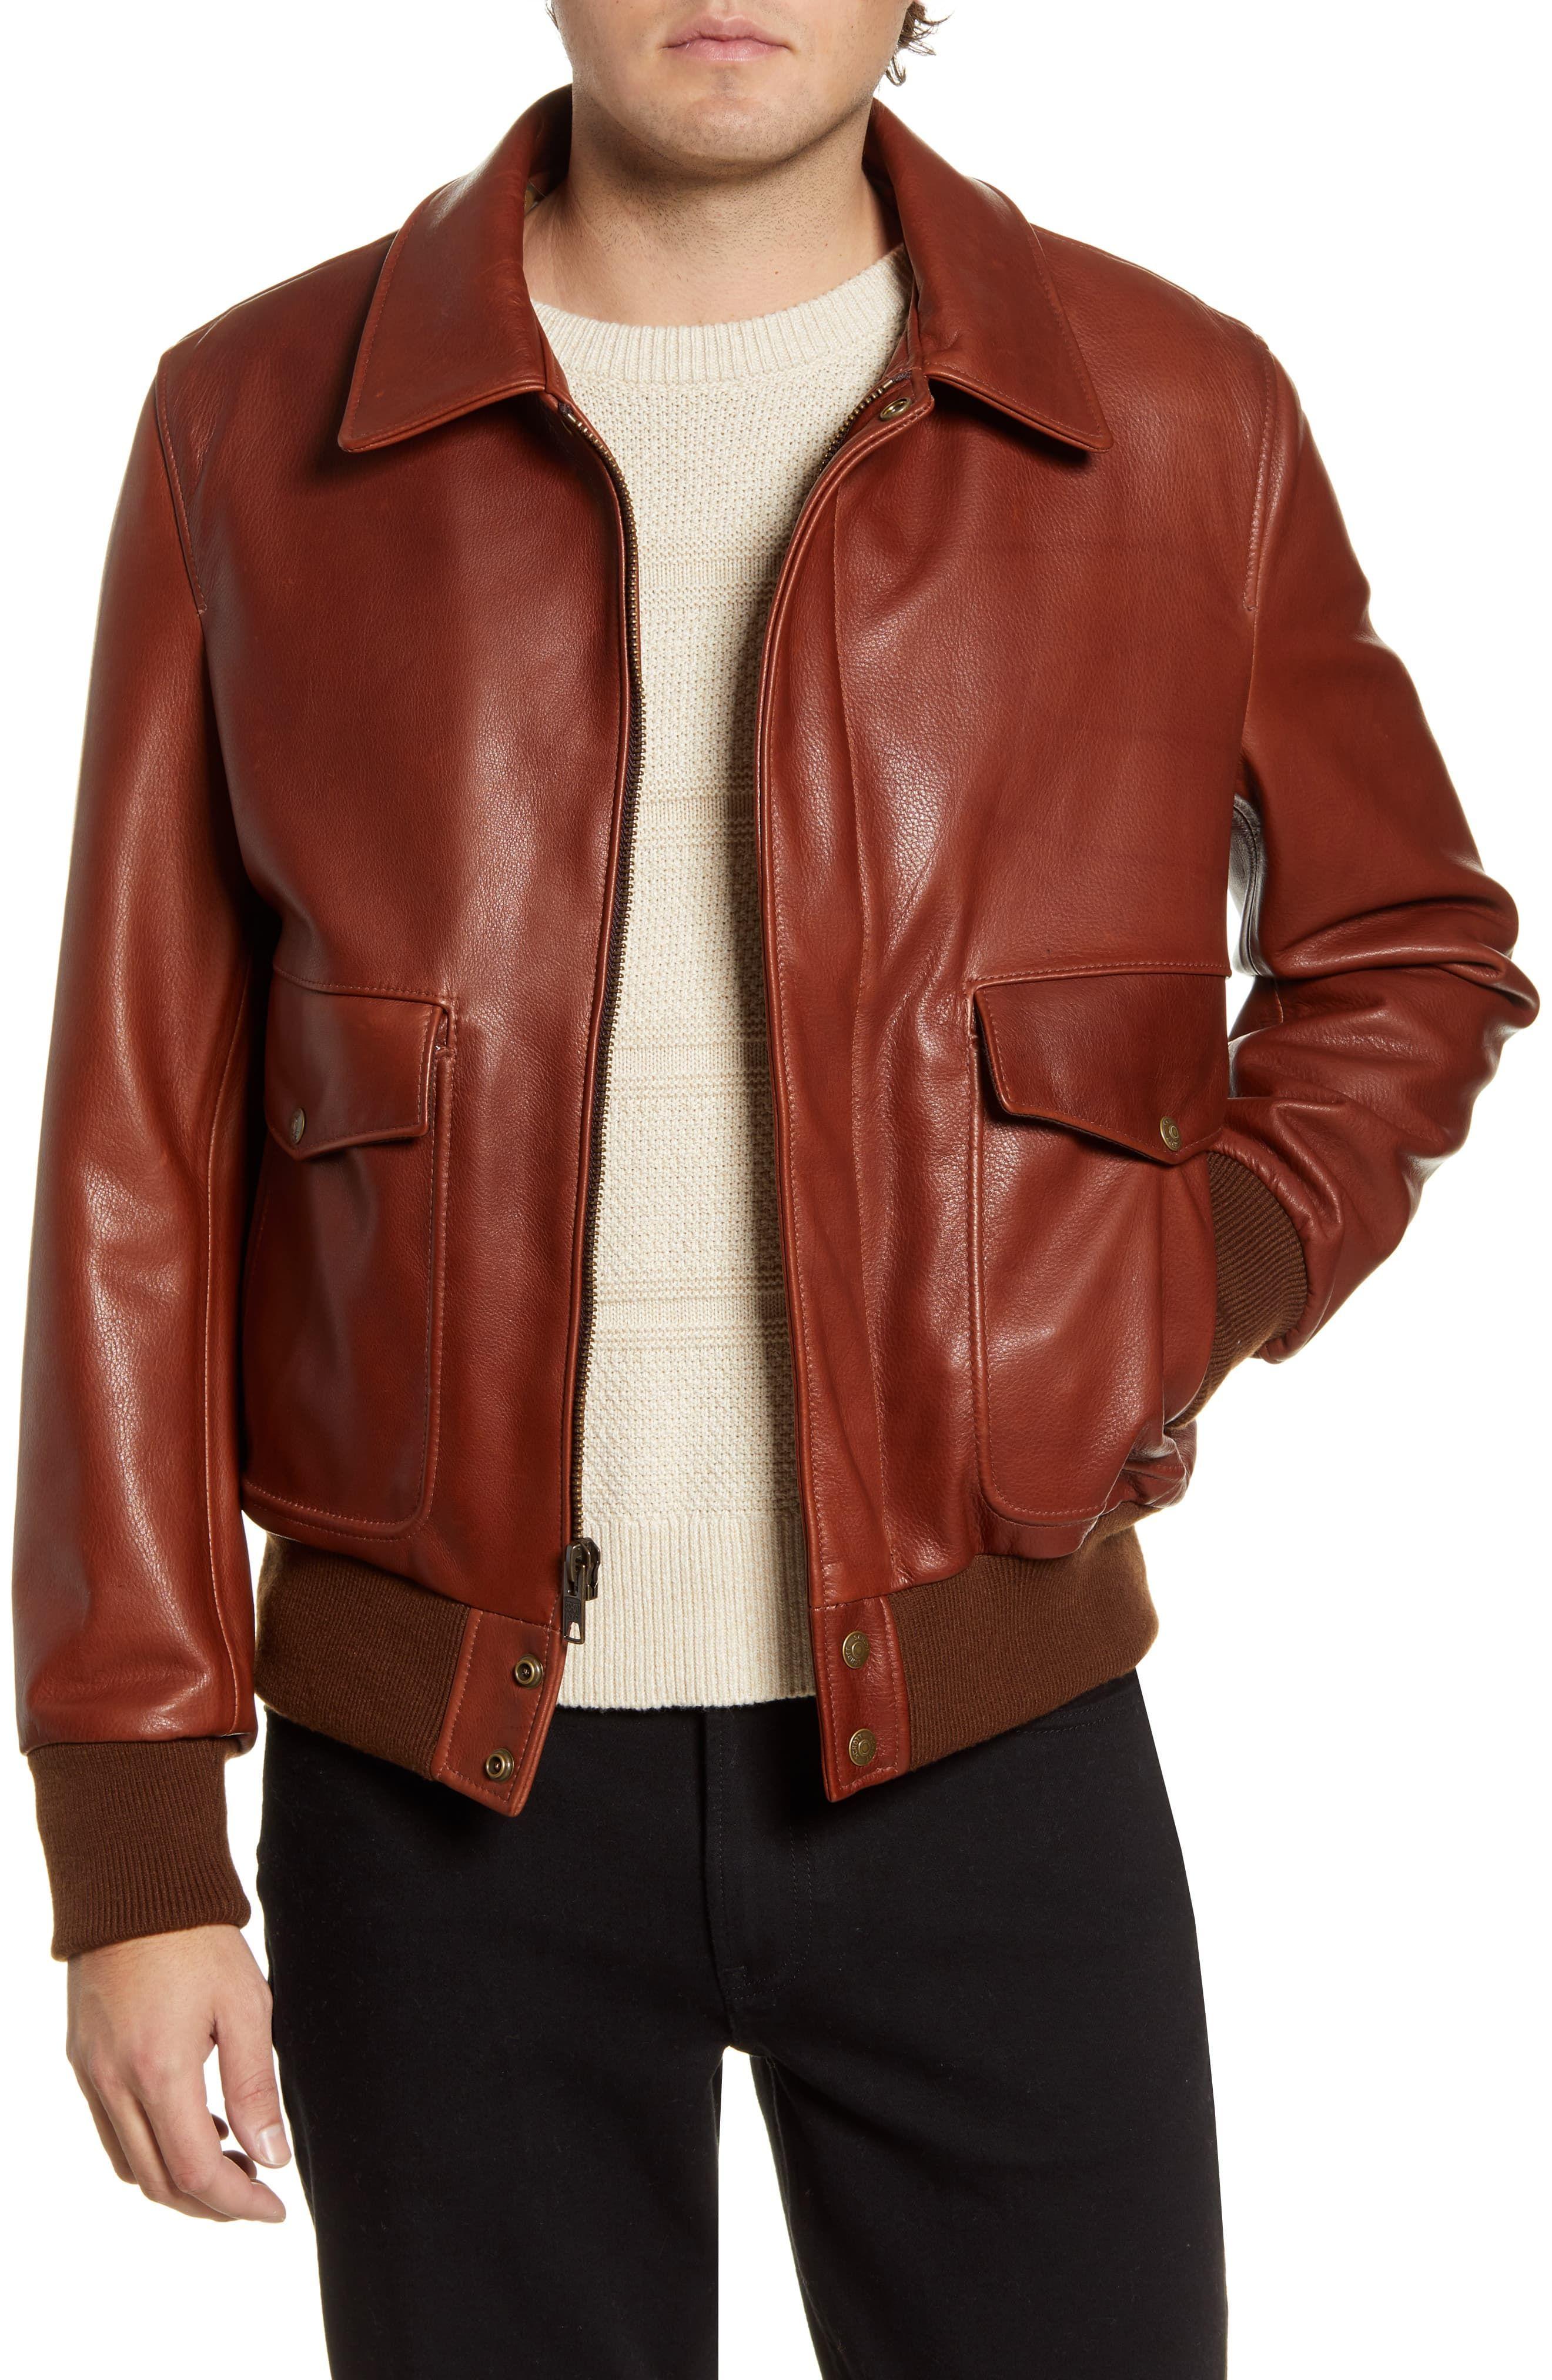 Schott Nyc Pebble Texture Leather Bomber Jacket Nordstrom In 2021 Leather Bomber Jacket Tan Leather Jackets Leather Jacket Men [ 4048 x 2640 Pixel ]